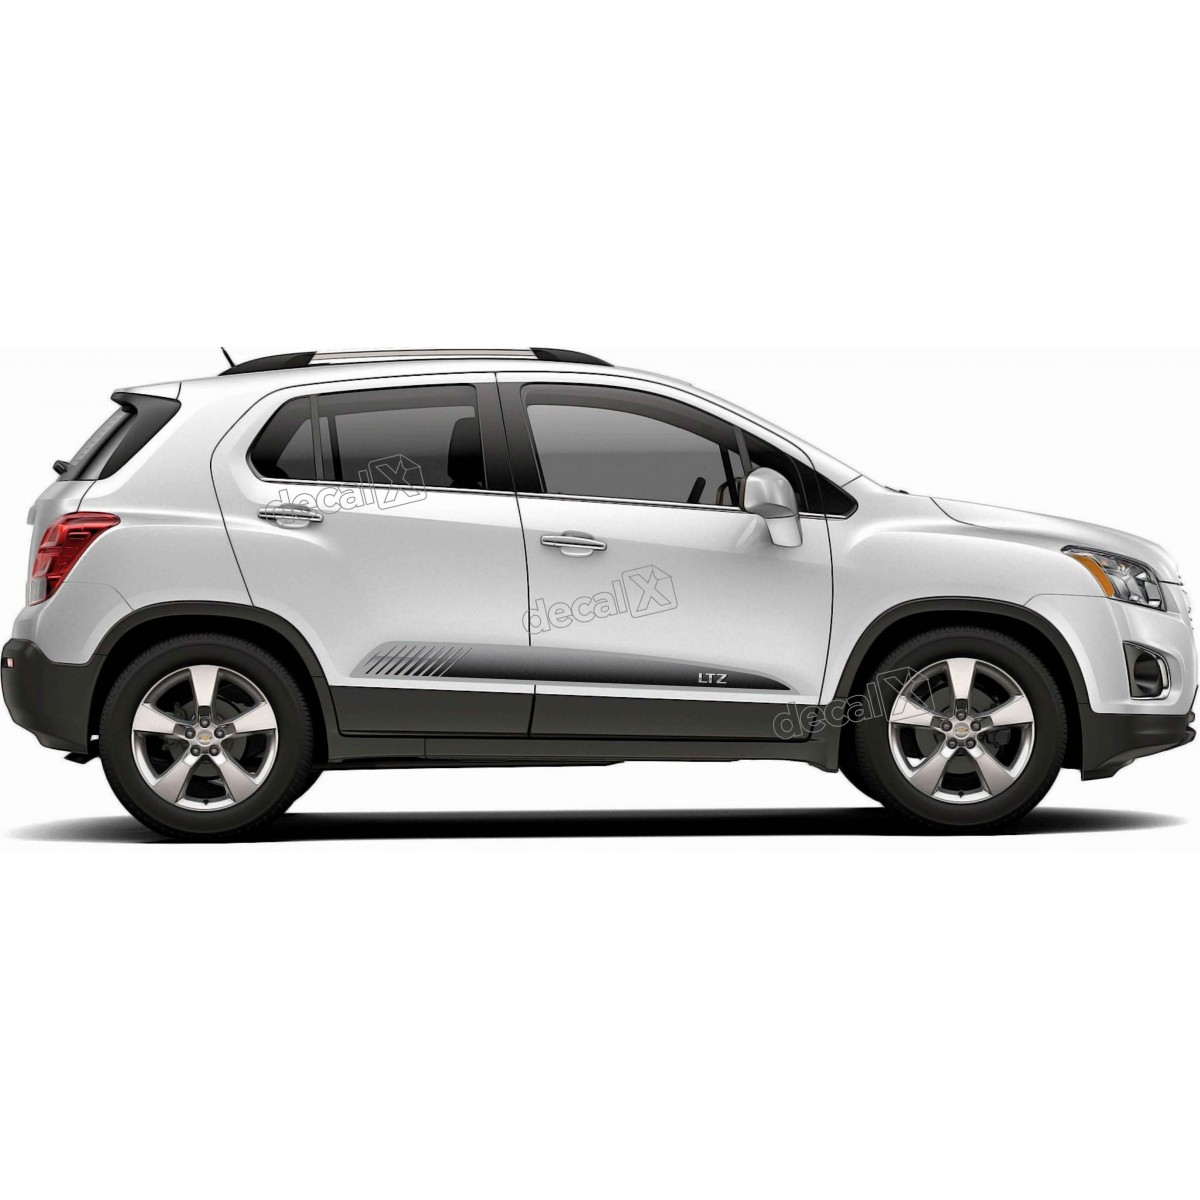 Adesivo Faixa Lateral Chevrolet Tracker Personalizado Tkr006